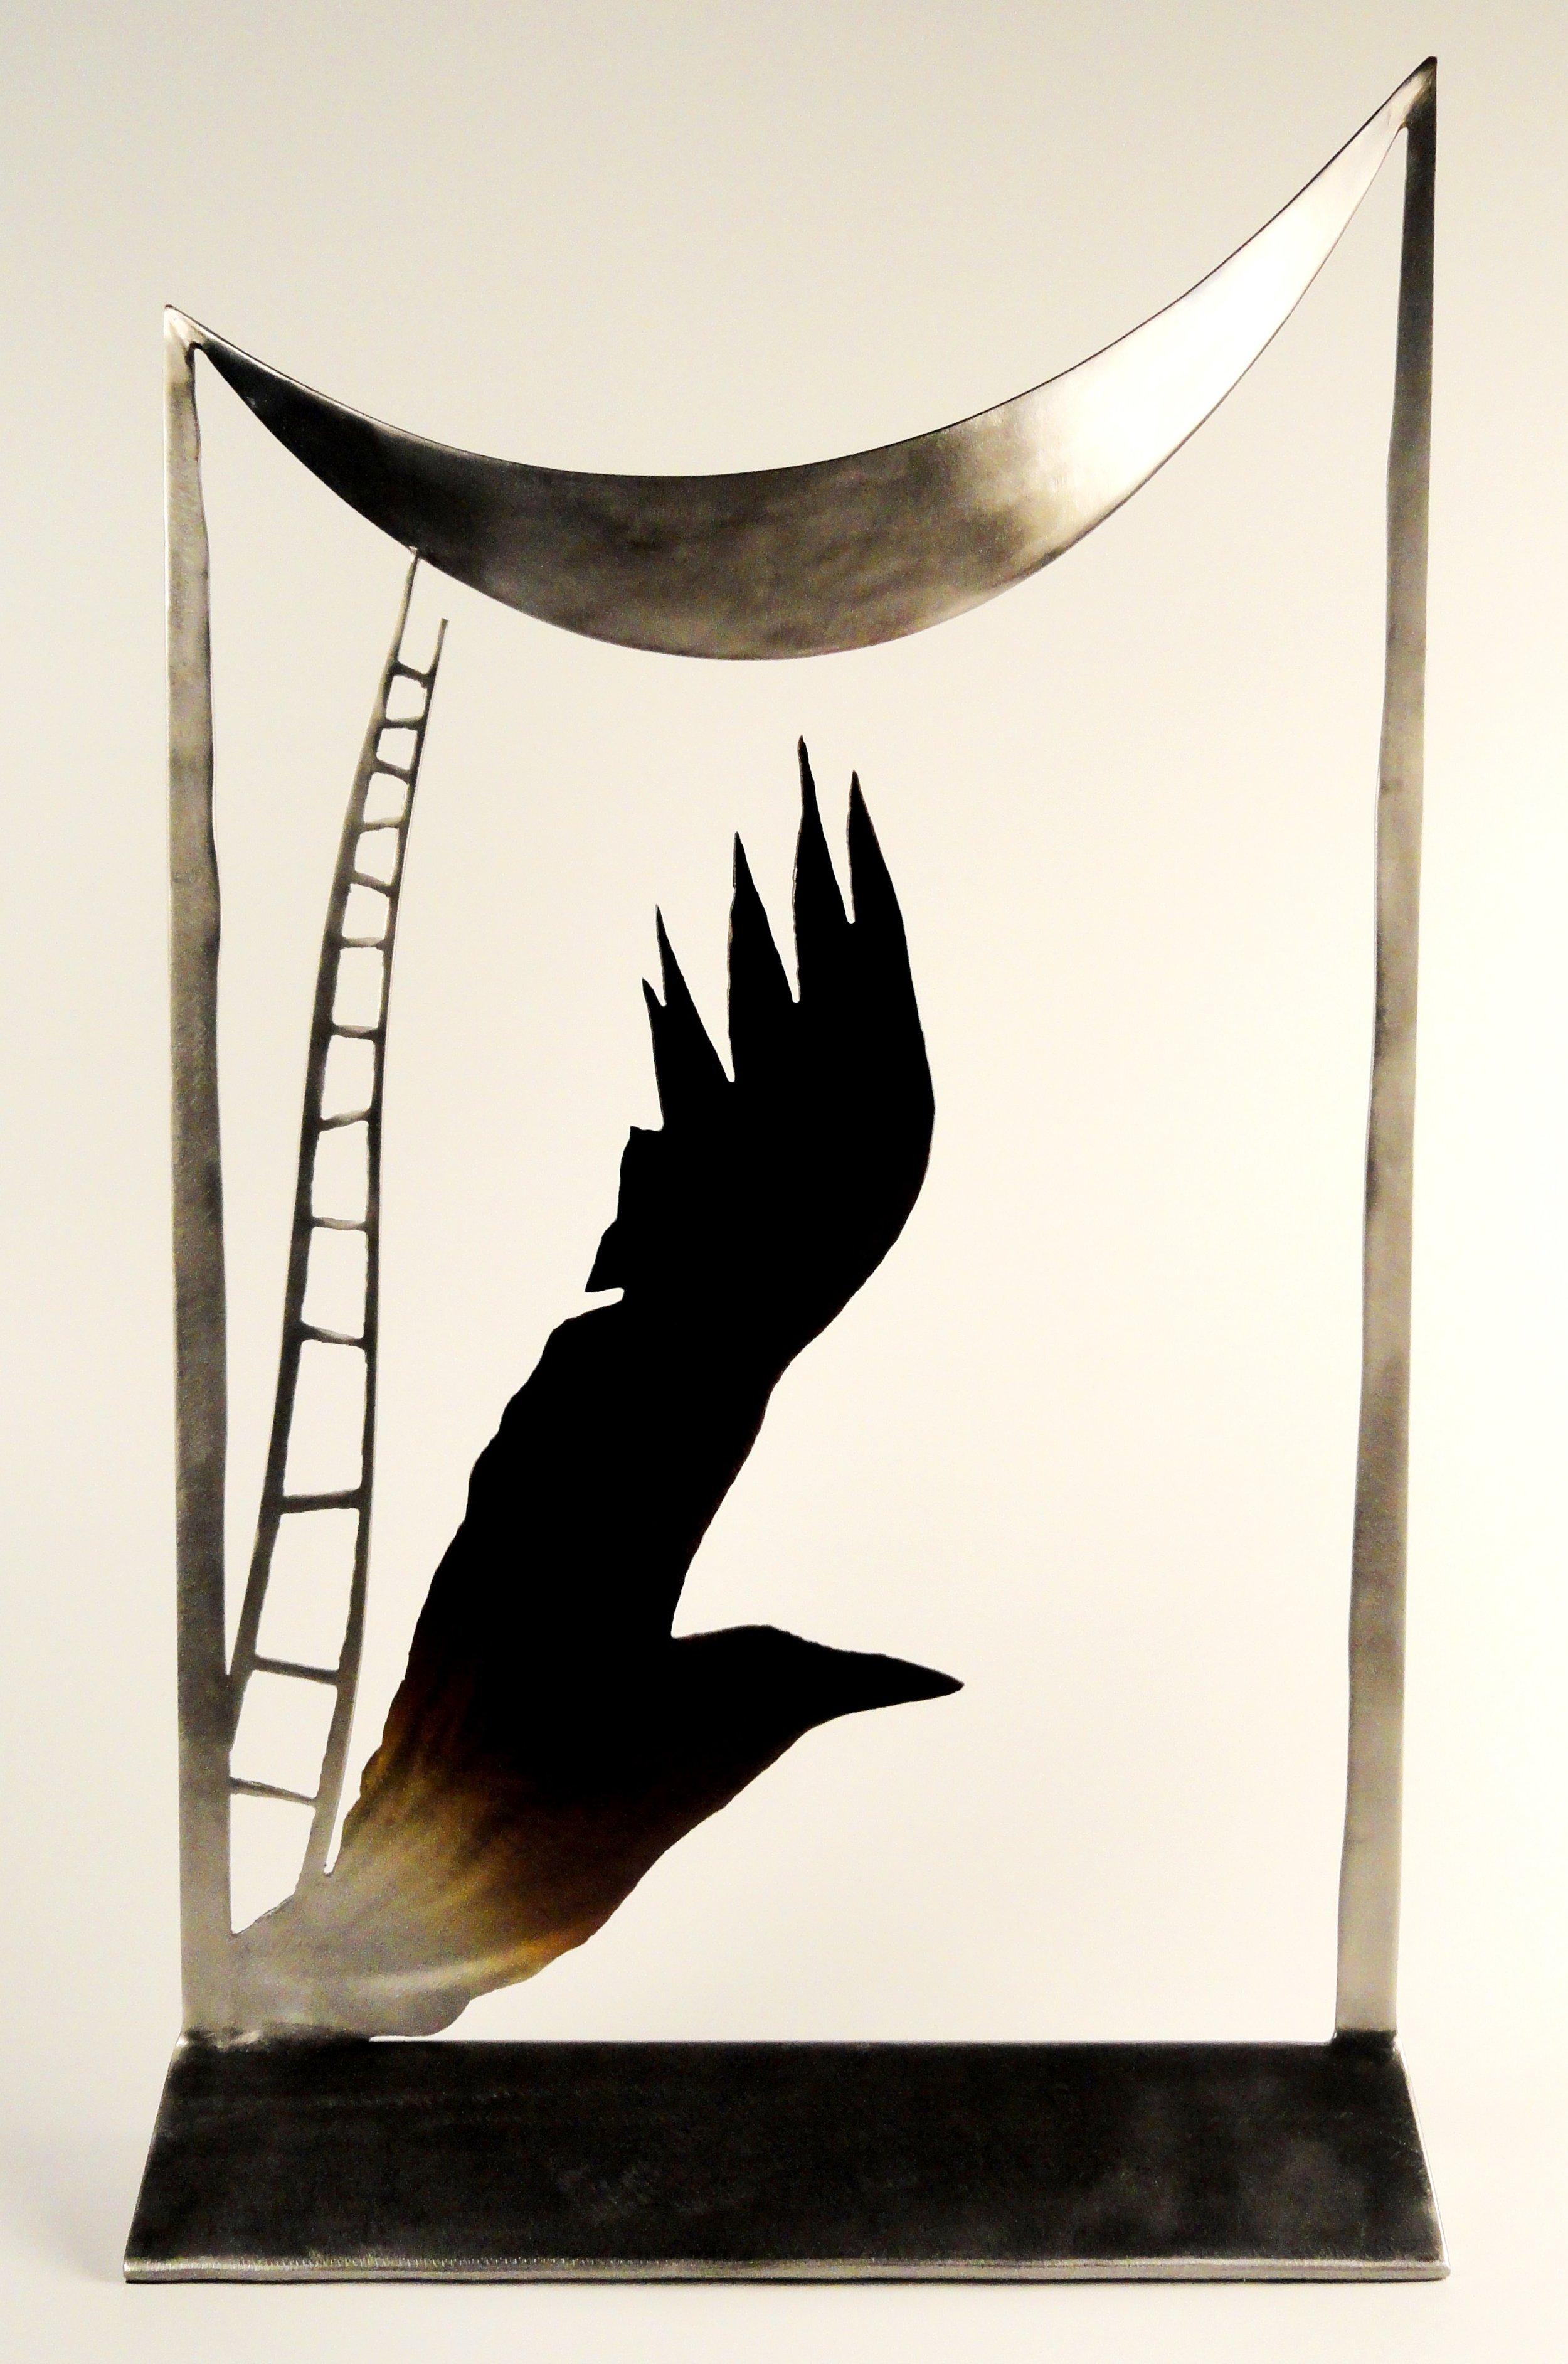 ANGEL (2013)